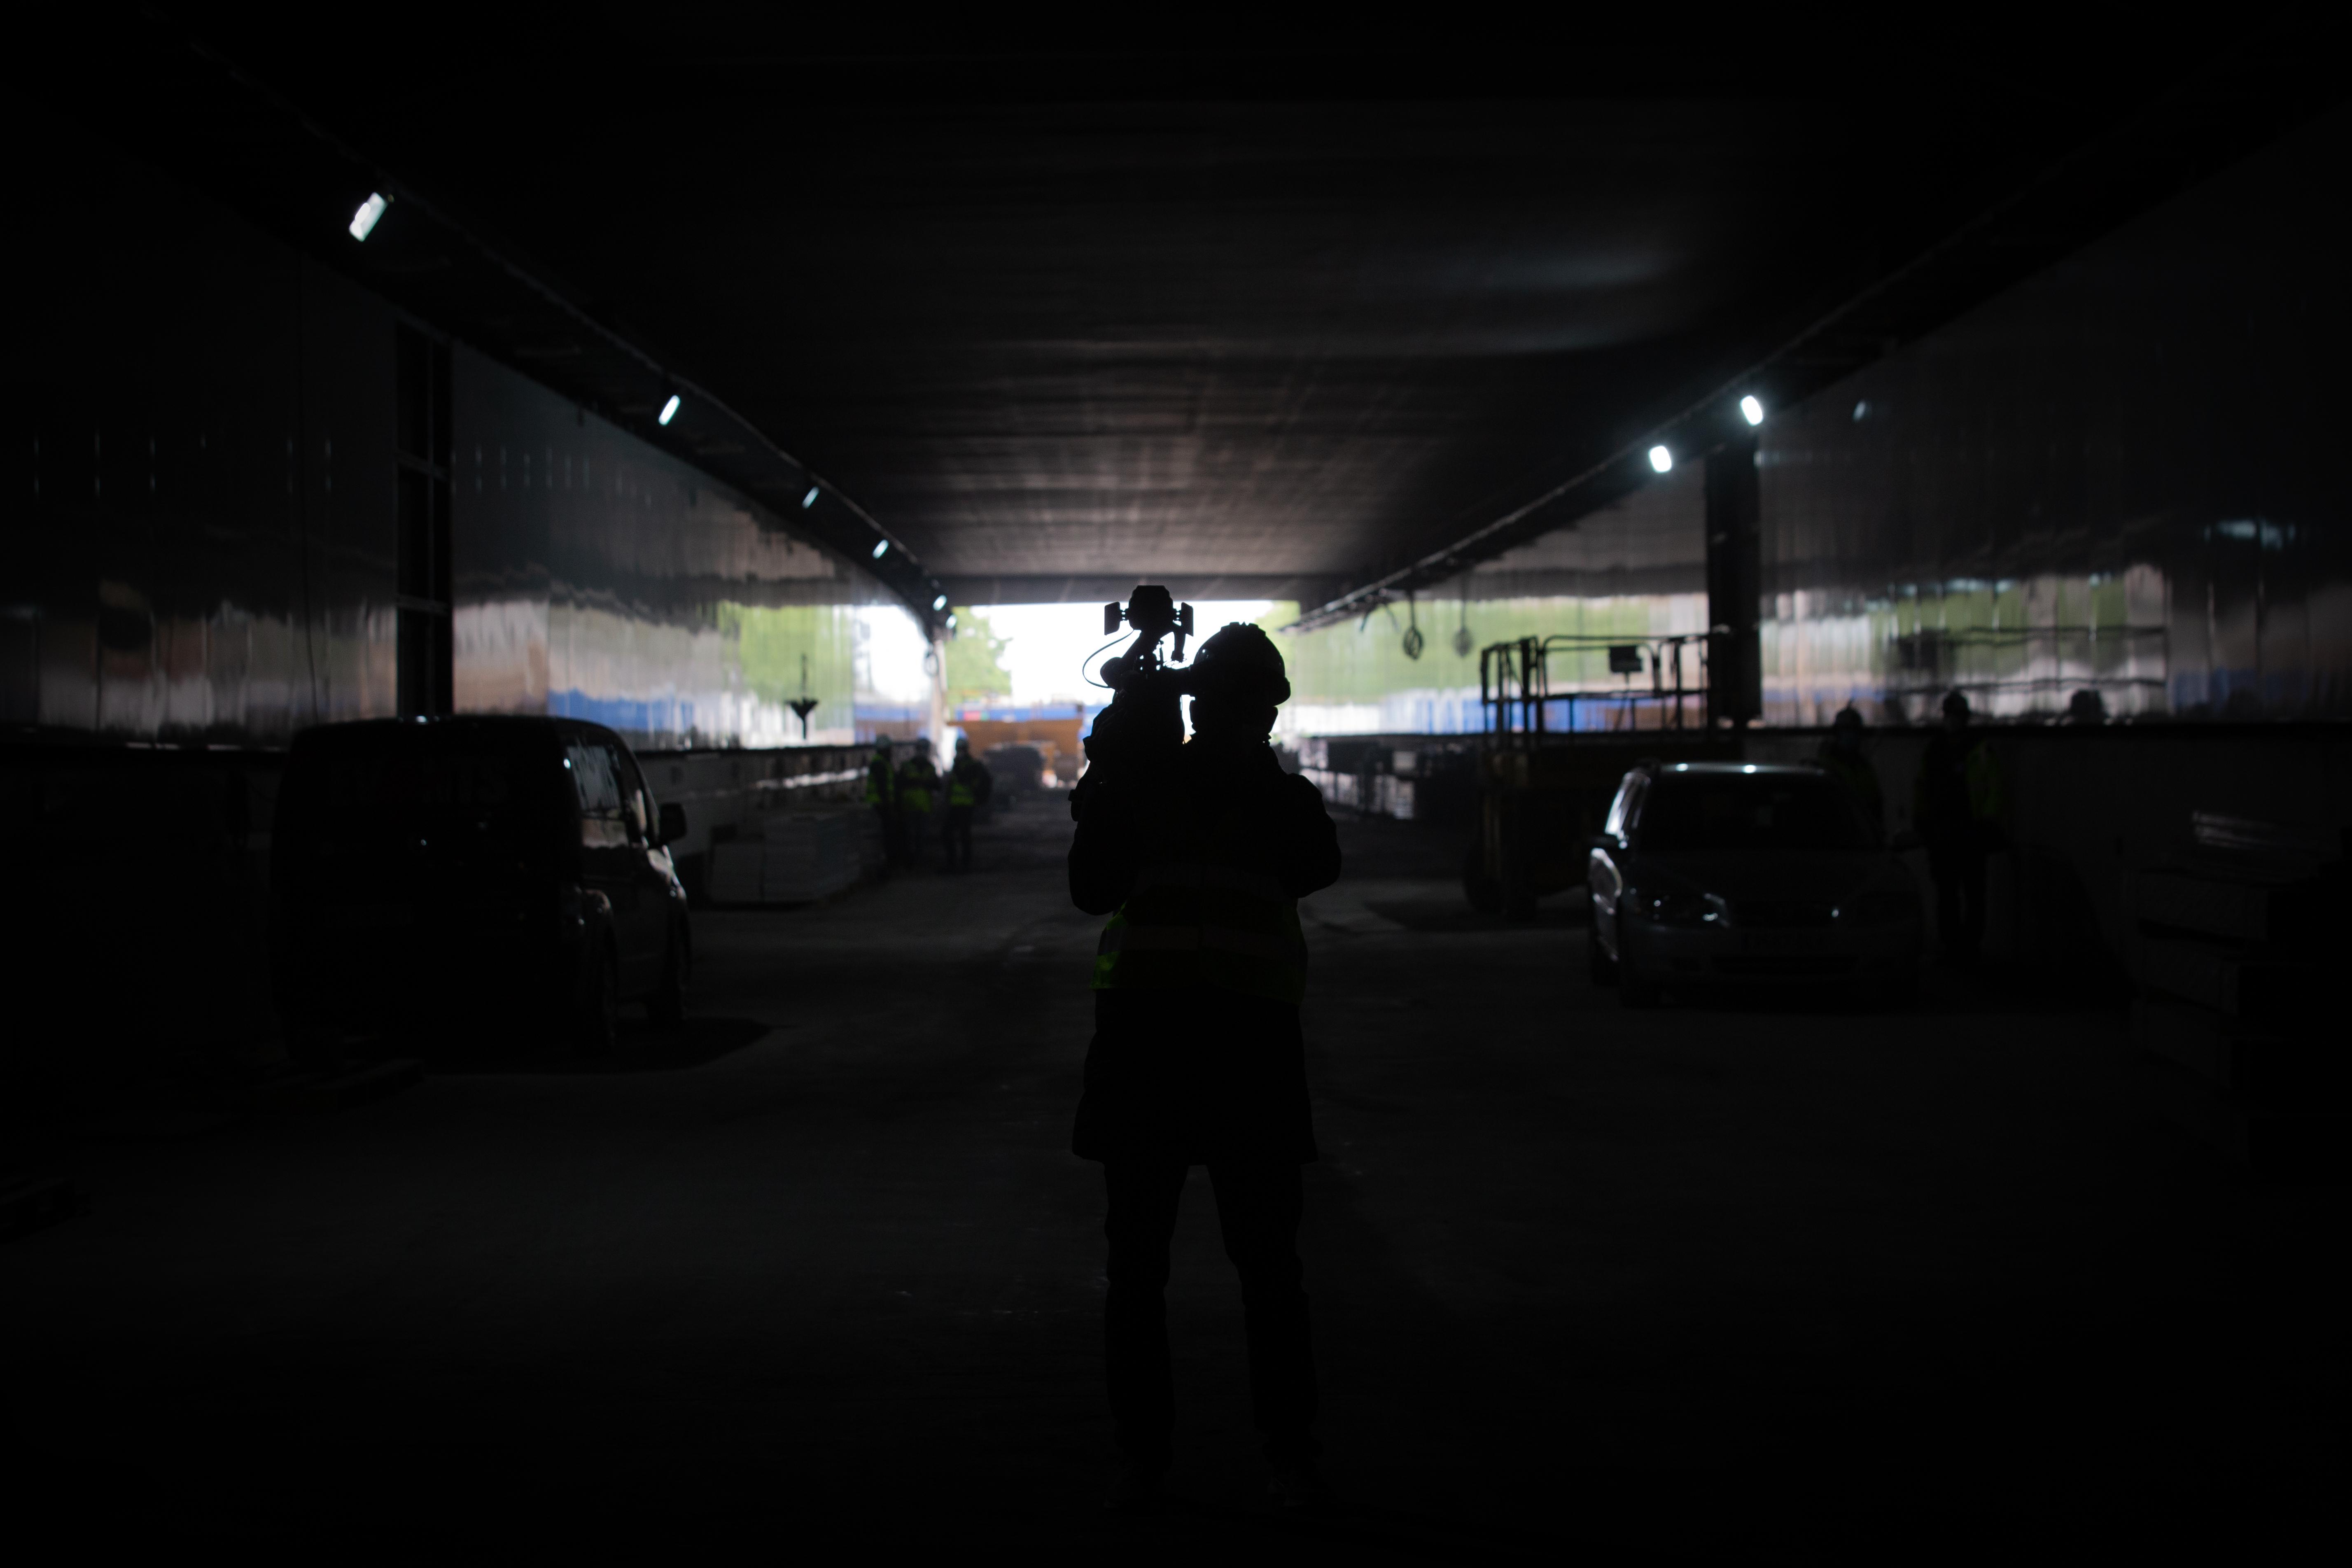 Obras es un túnel de Barcelona / David Zorrakino/Europa Press